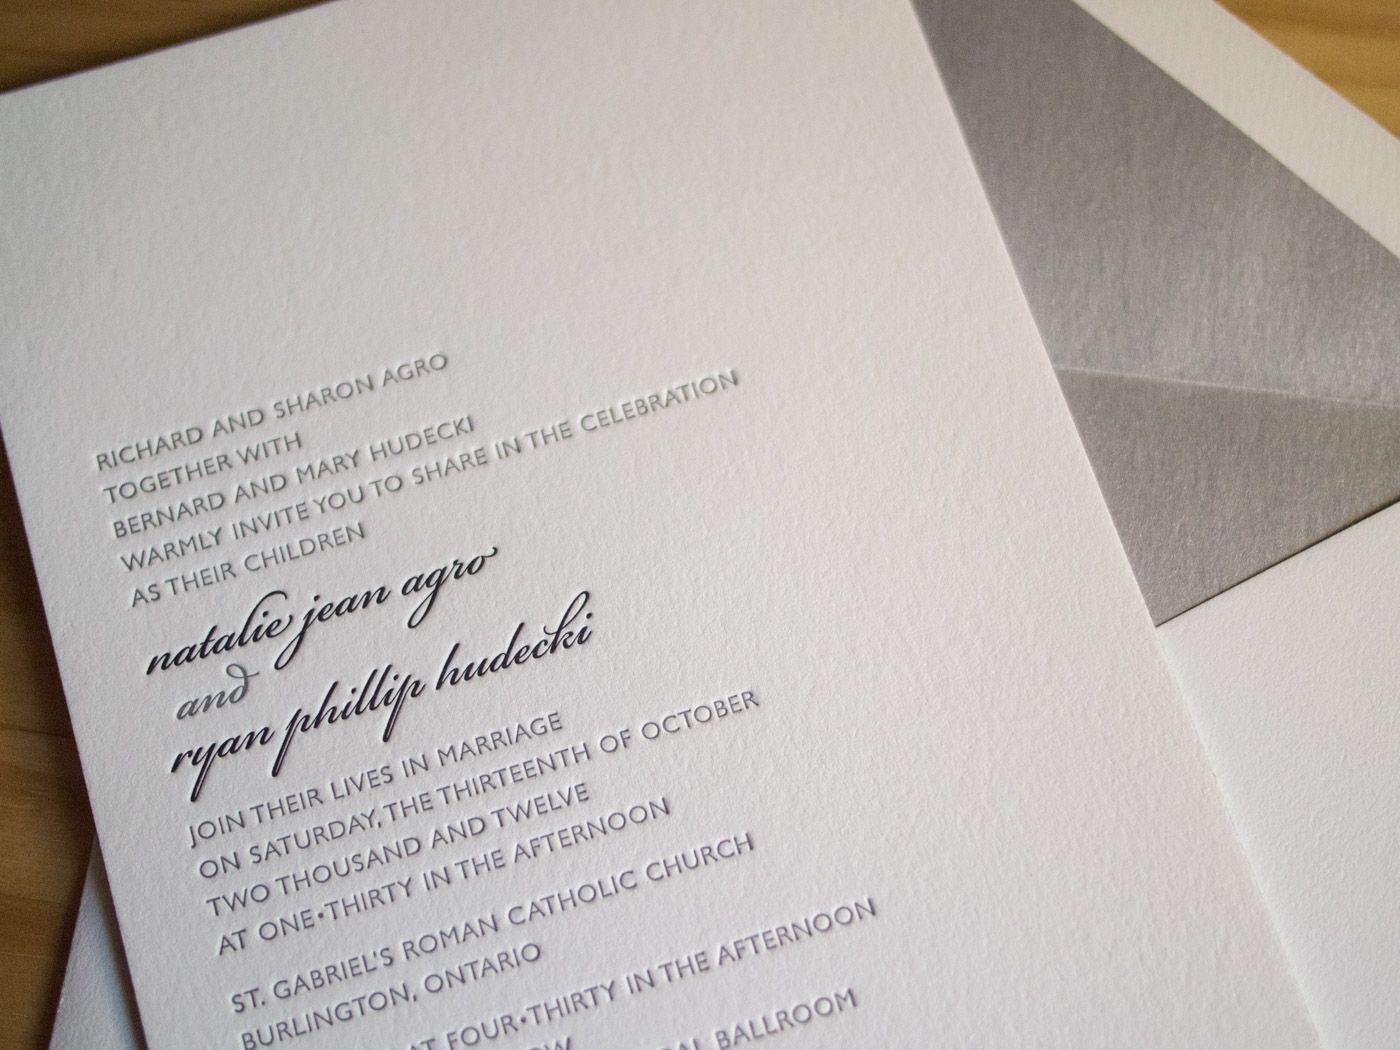 Ontario invitation from Parklife Press | TamRon Wedding: Design ...